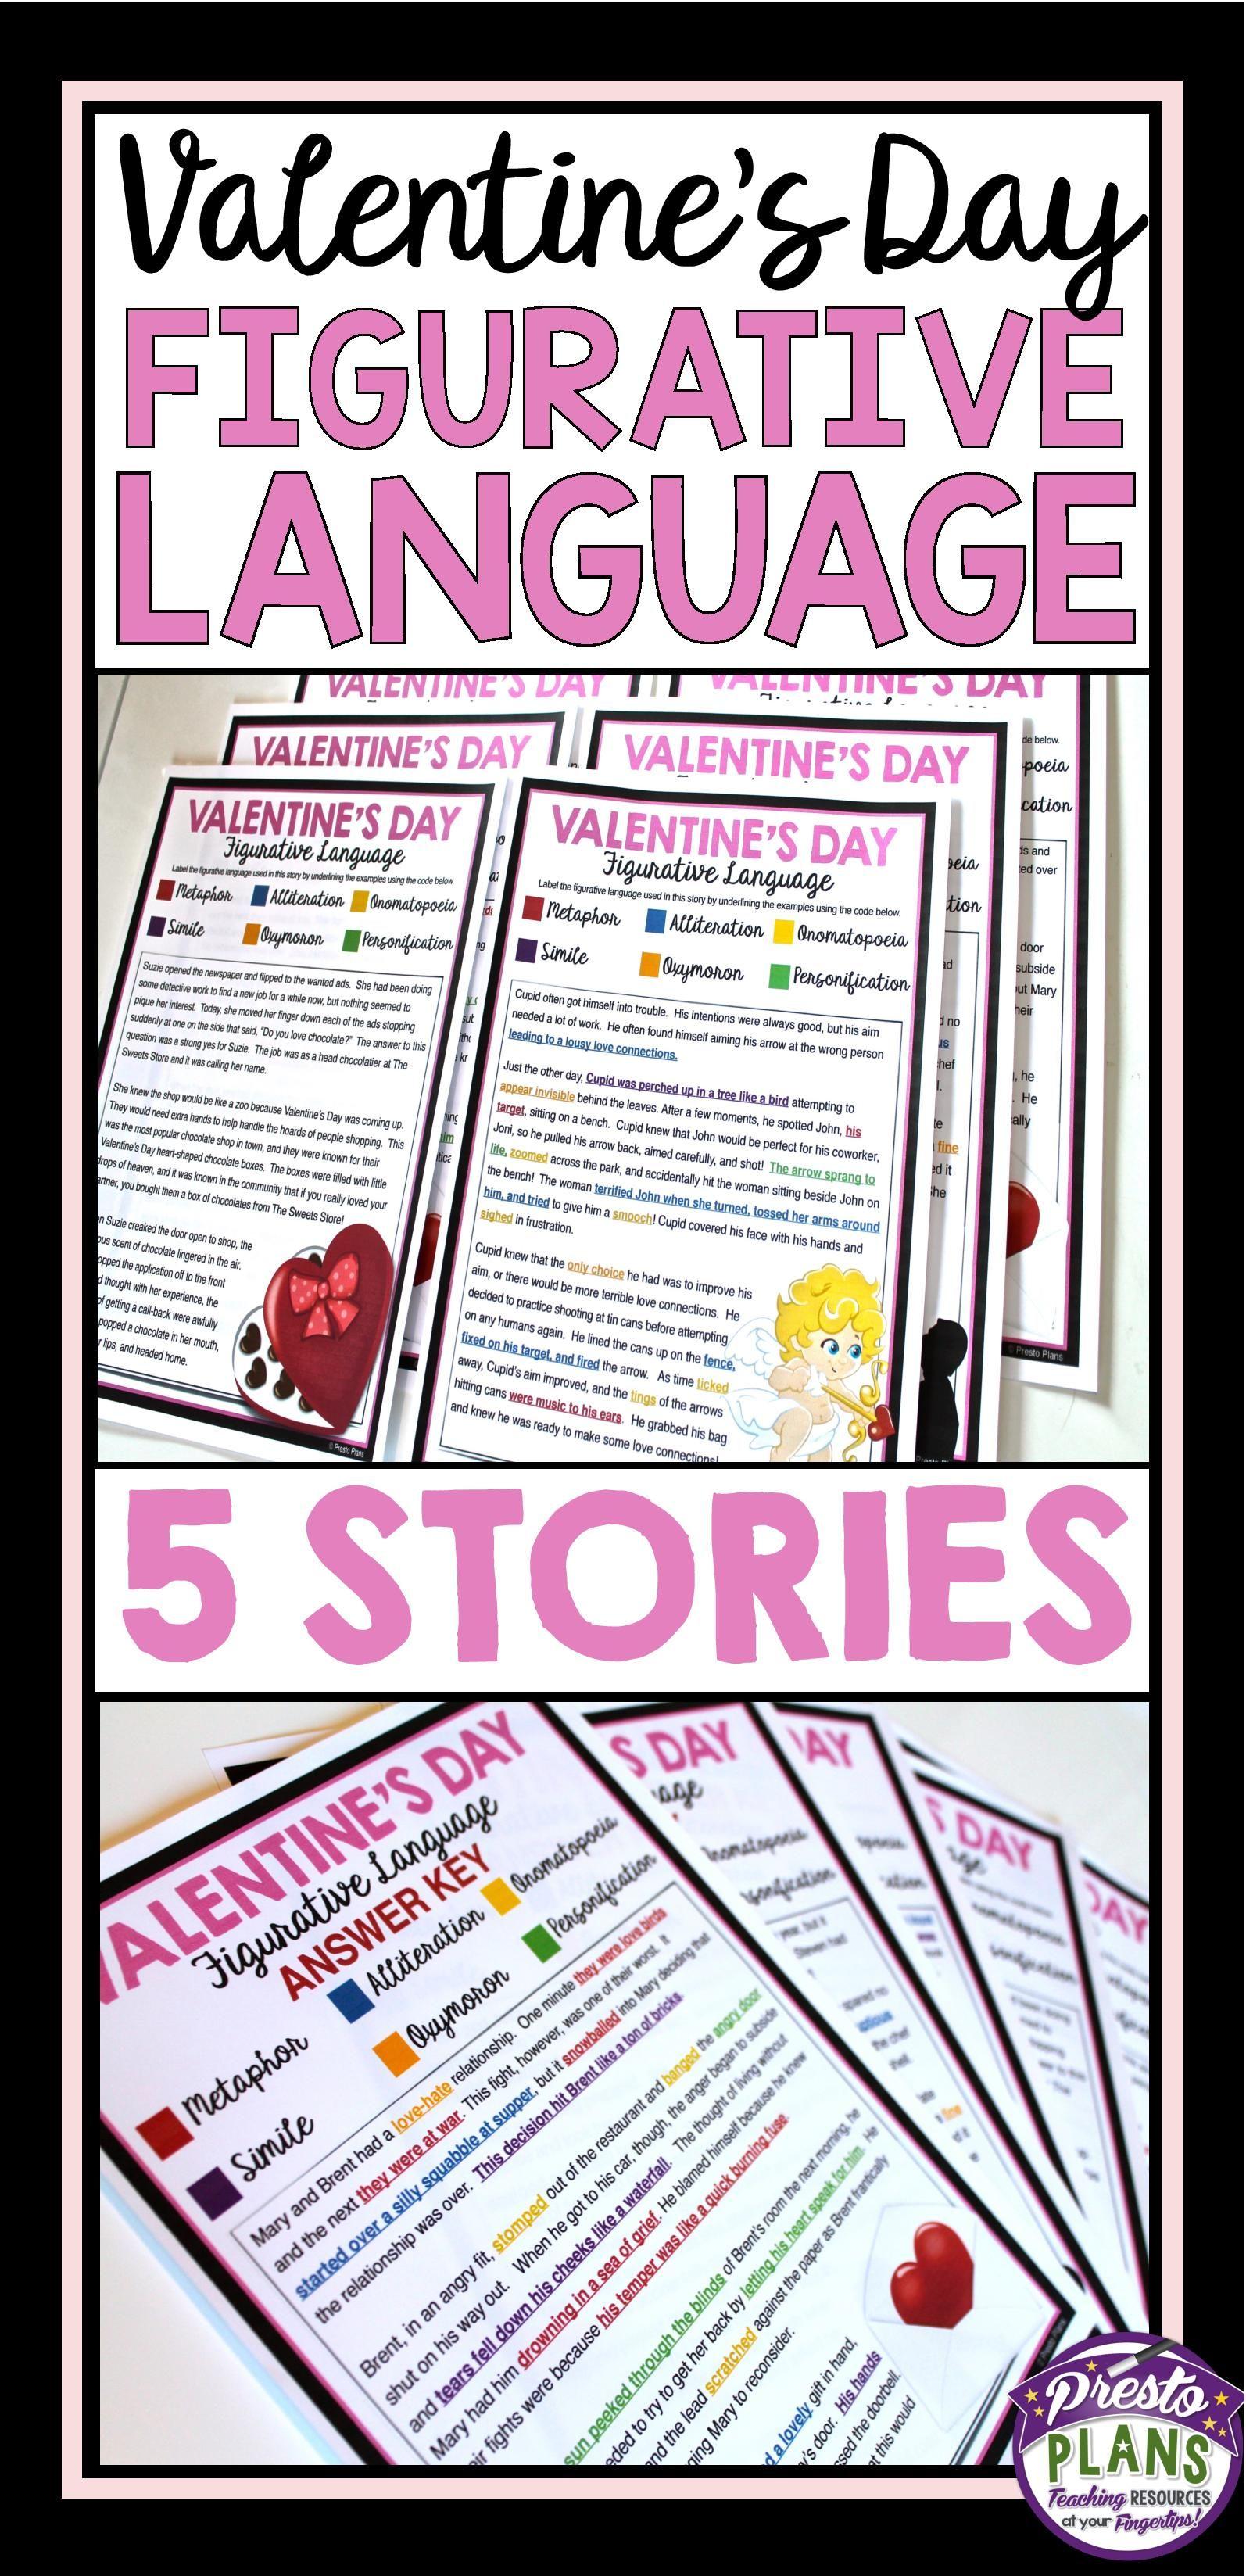 Valentines Day Reading Figurative Language 5 Stories